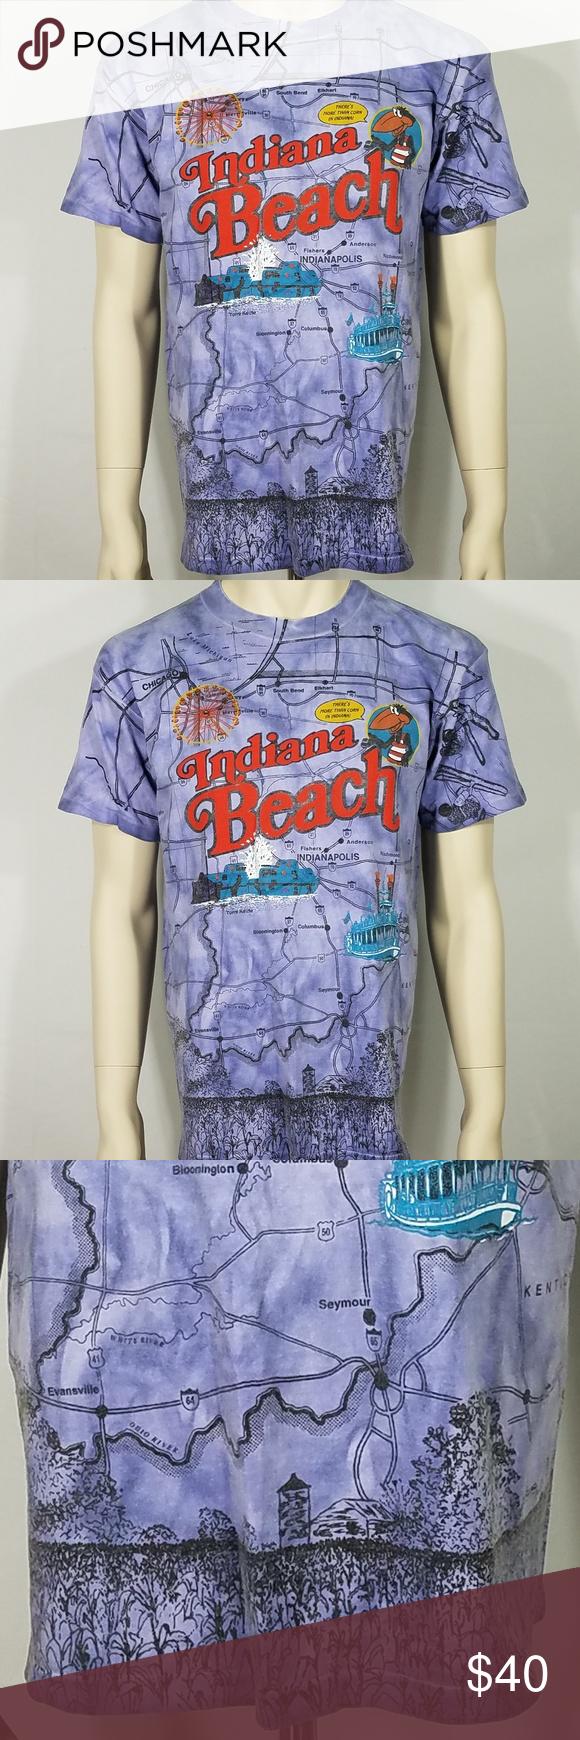 Indiana Beach road map graphic t-shirt Adult Large | My Posh Picks ...